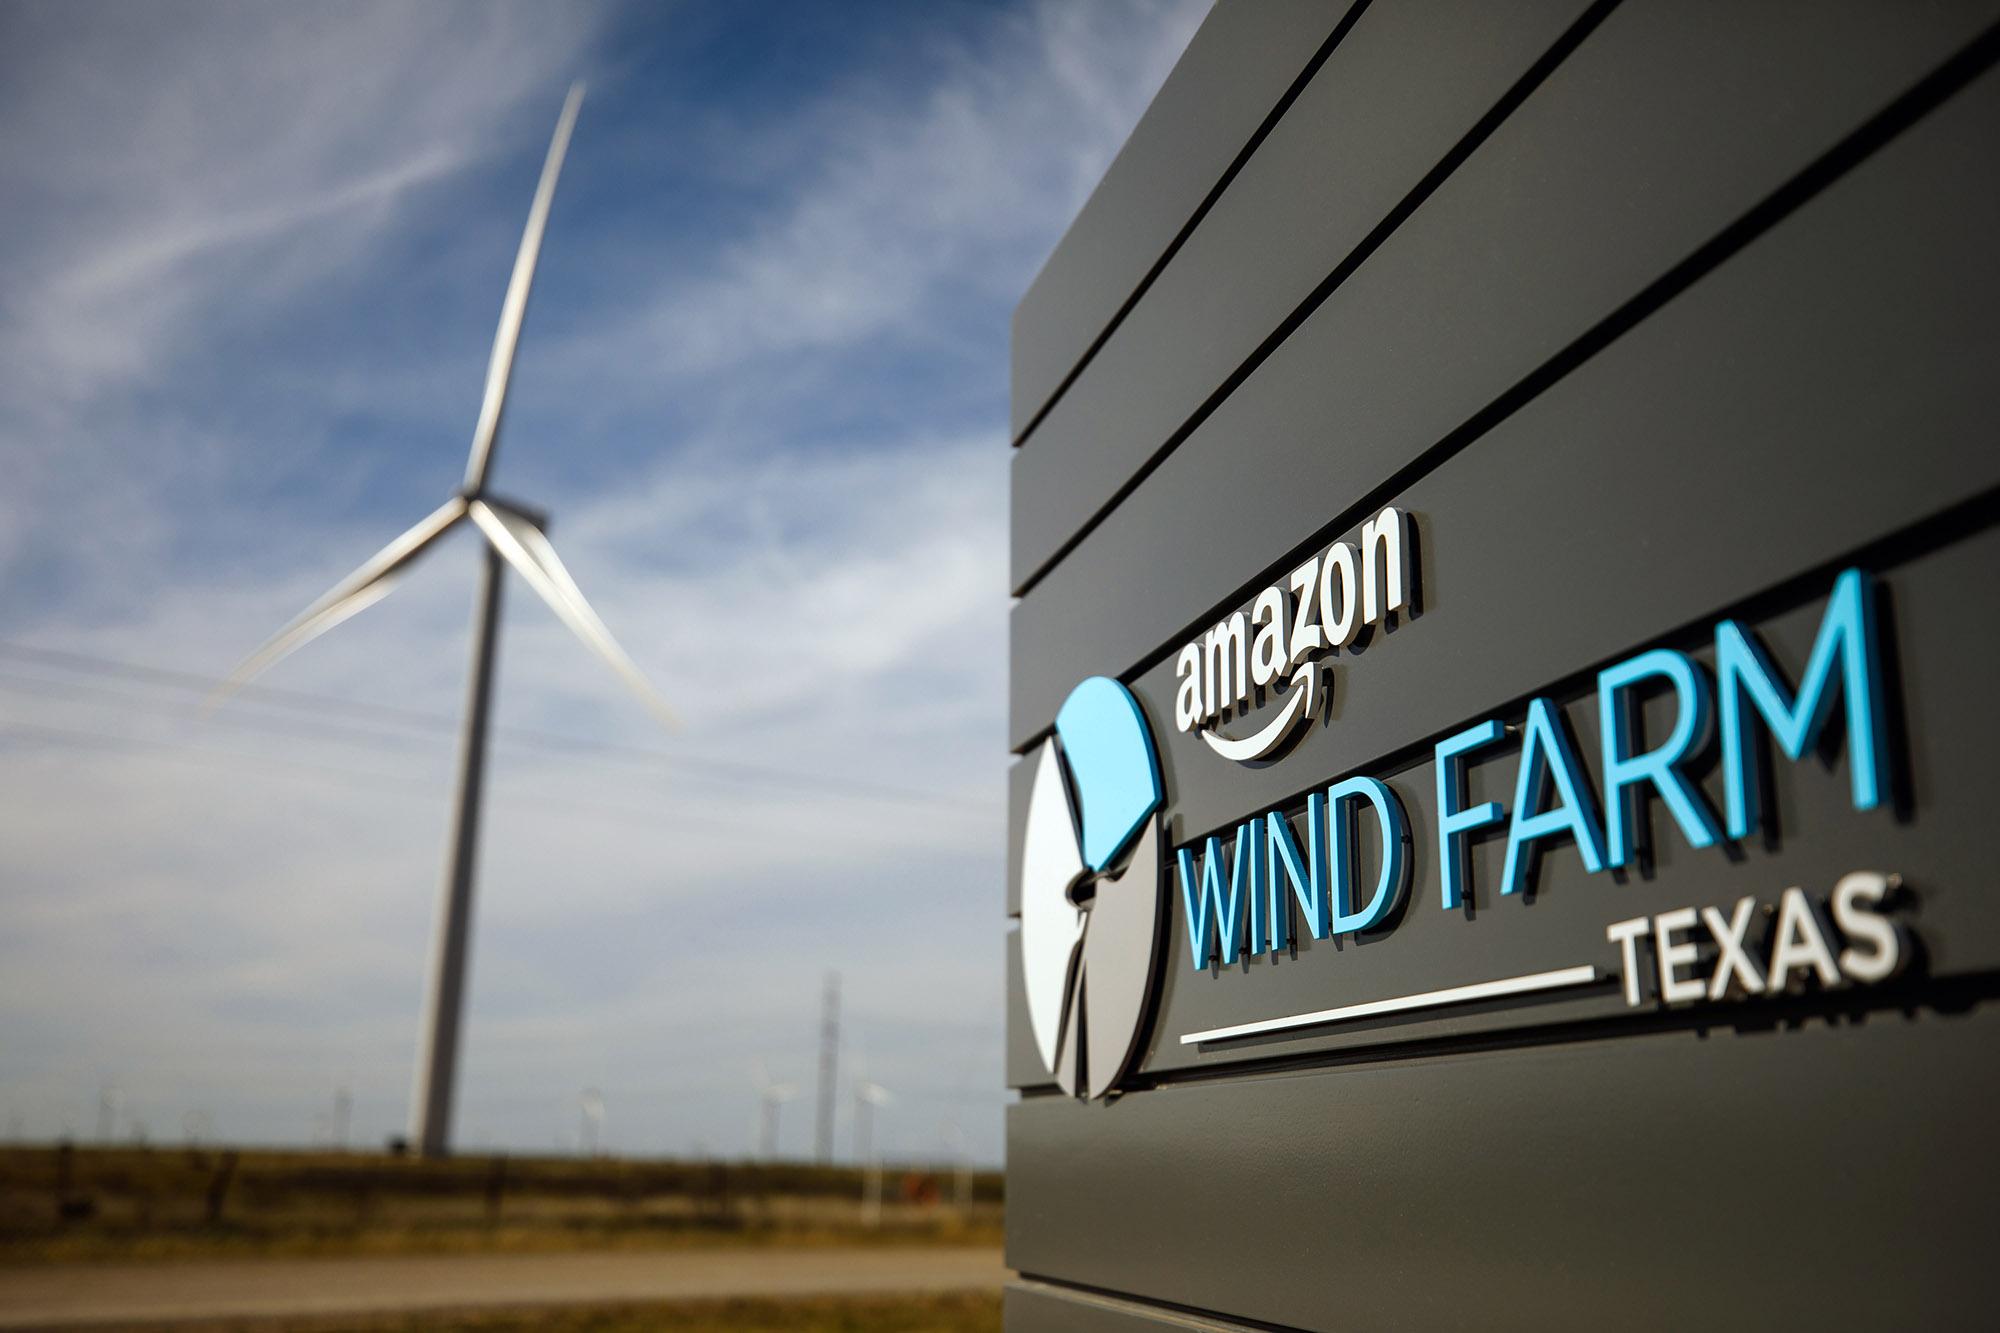 Amazon Wind Farm Texas.